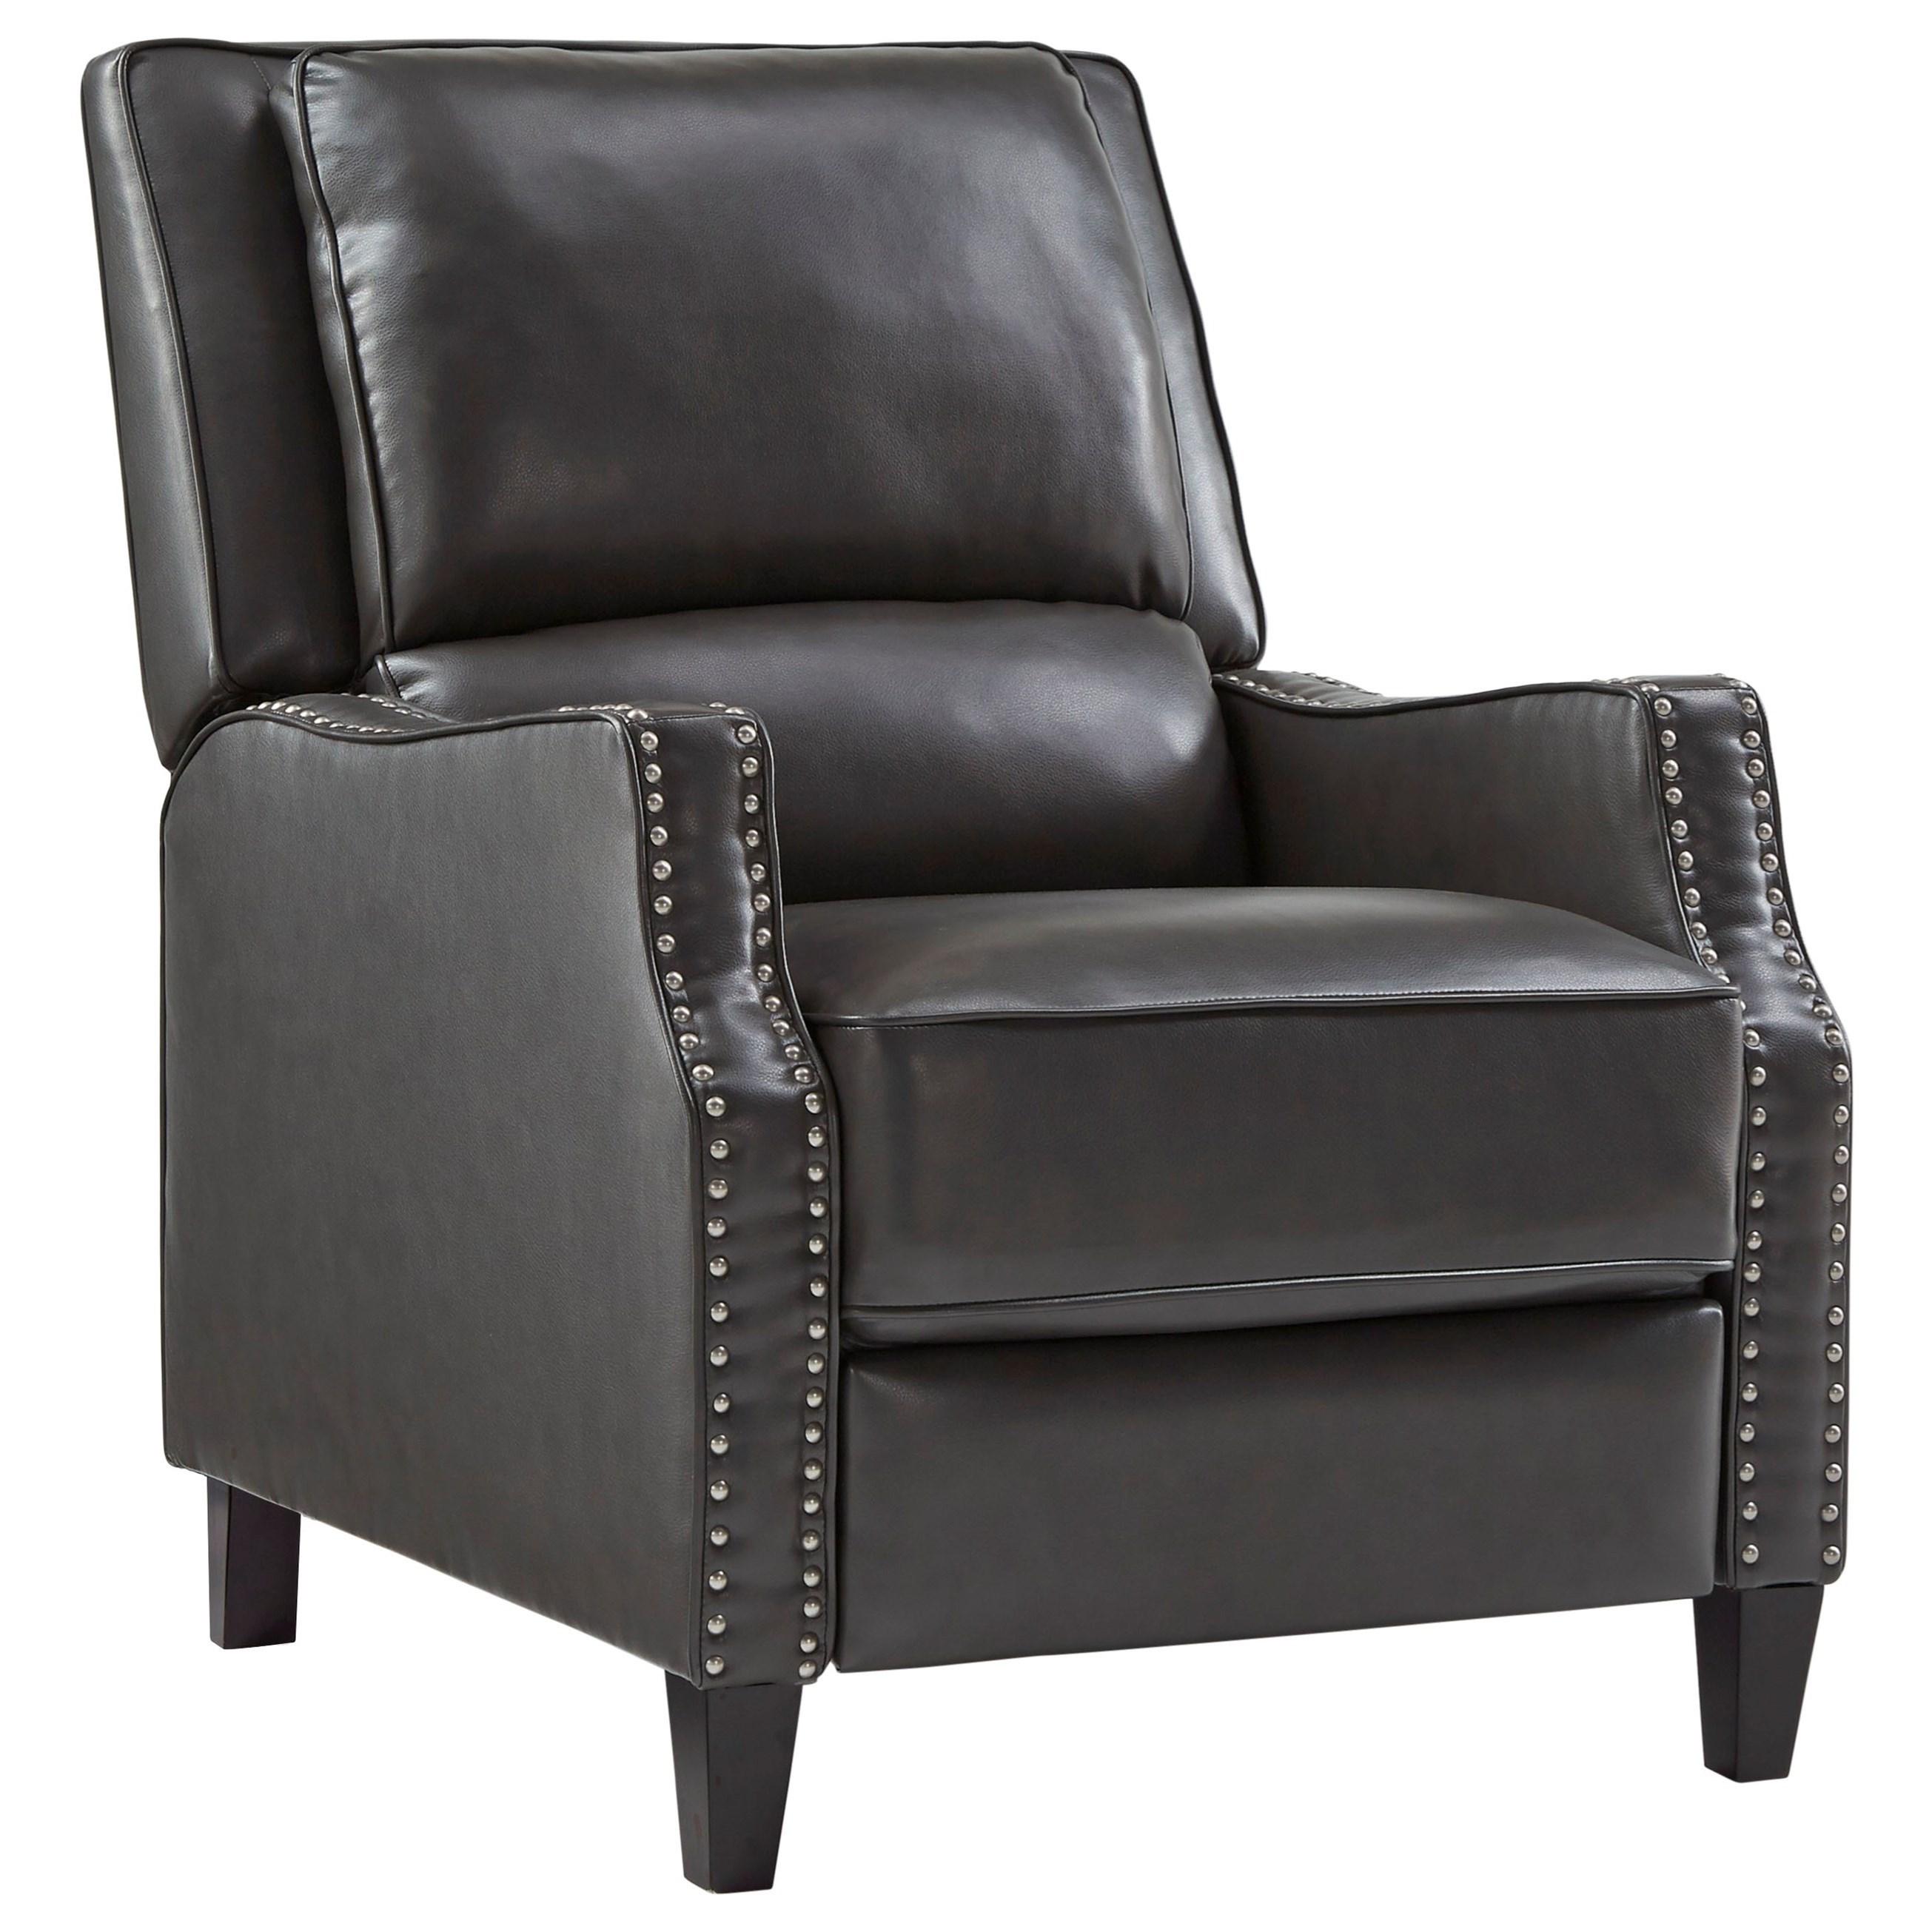 Standard Furniture Alston Sleek Recliner With Tight